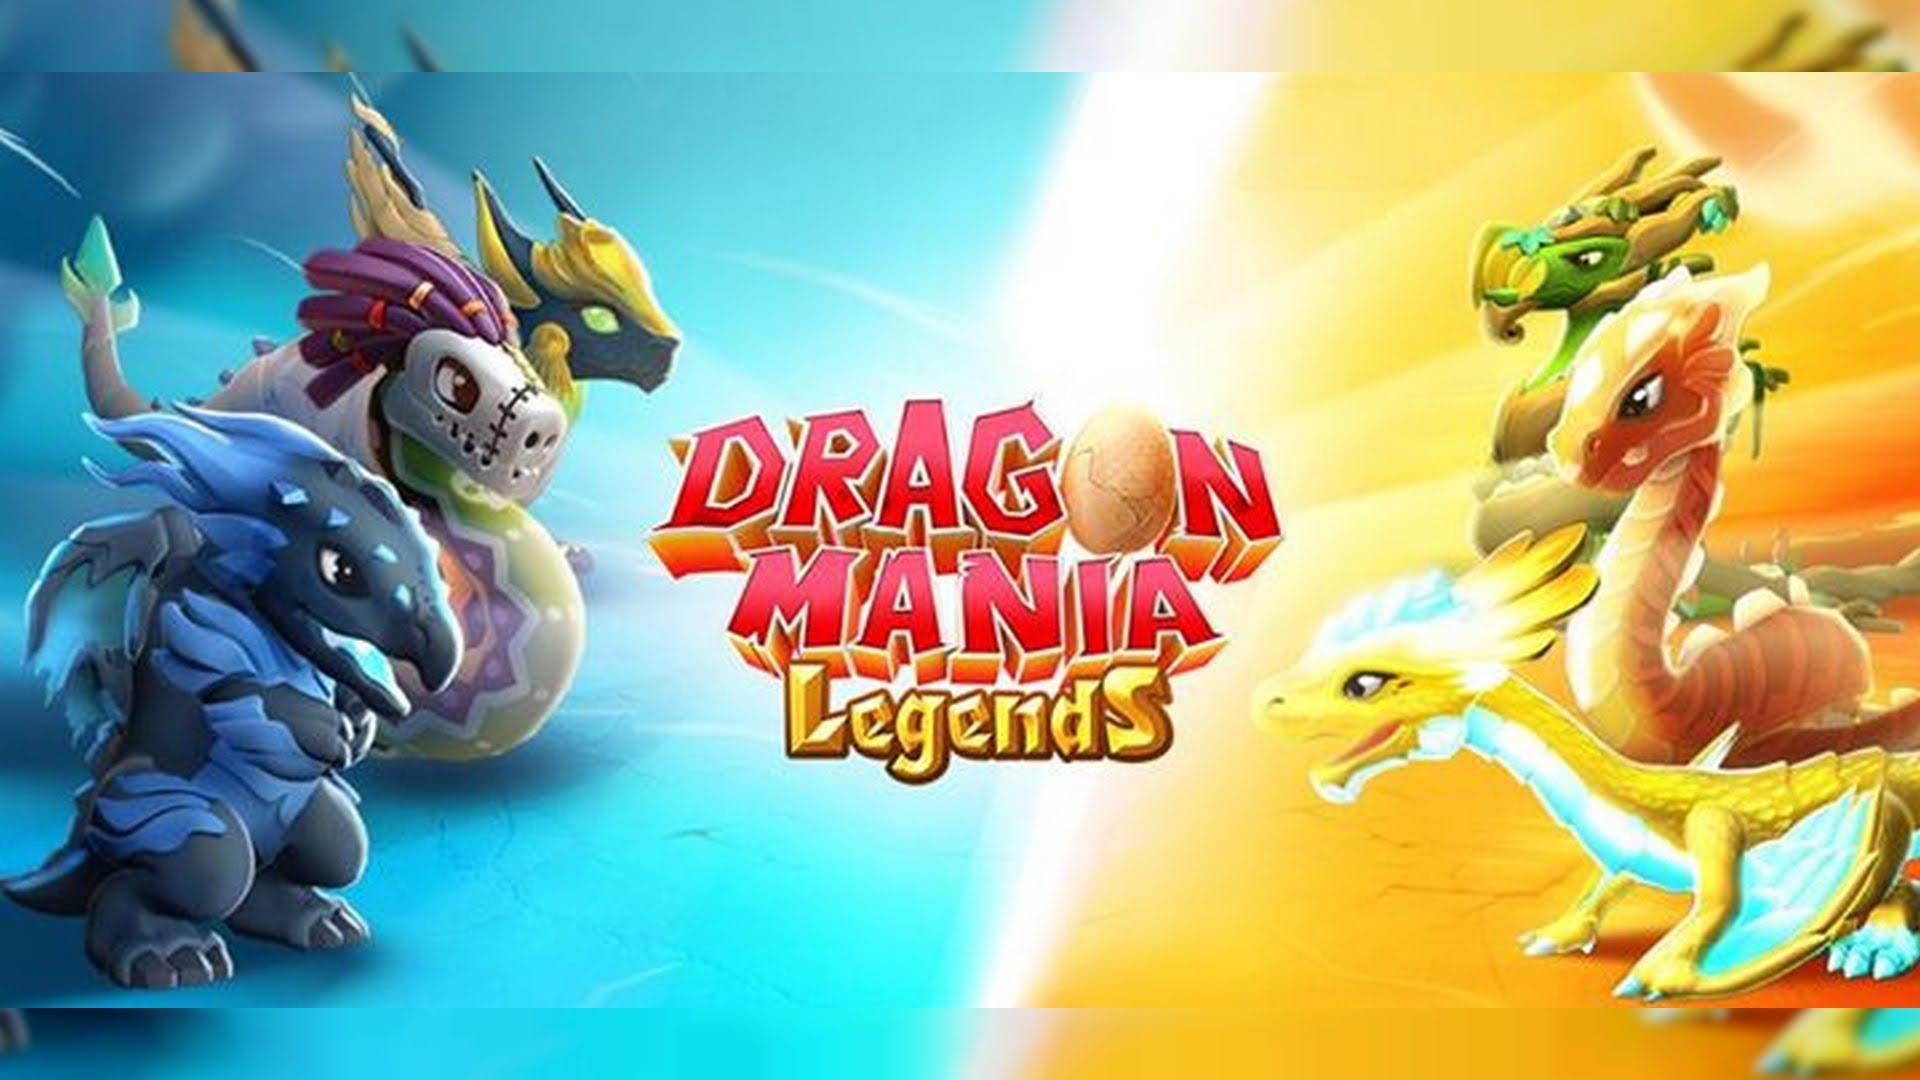 Dragon Legends: Dragon Mania Legends Game Guide